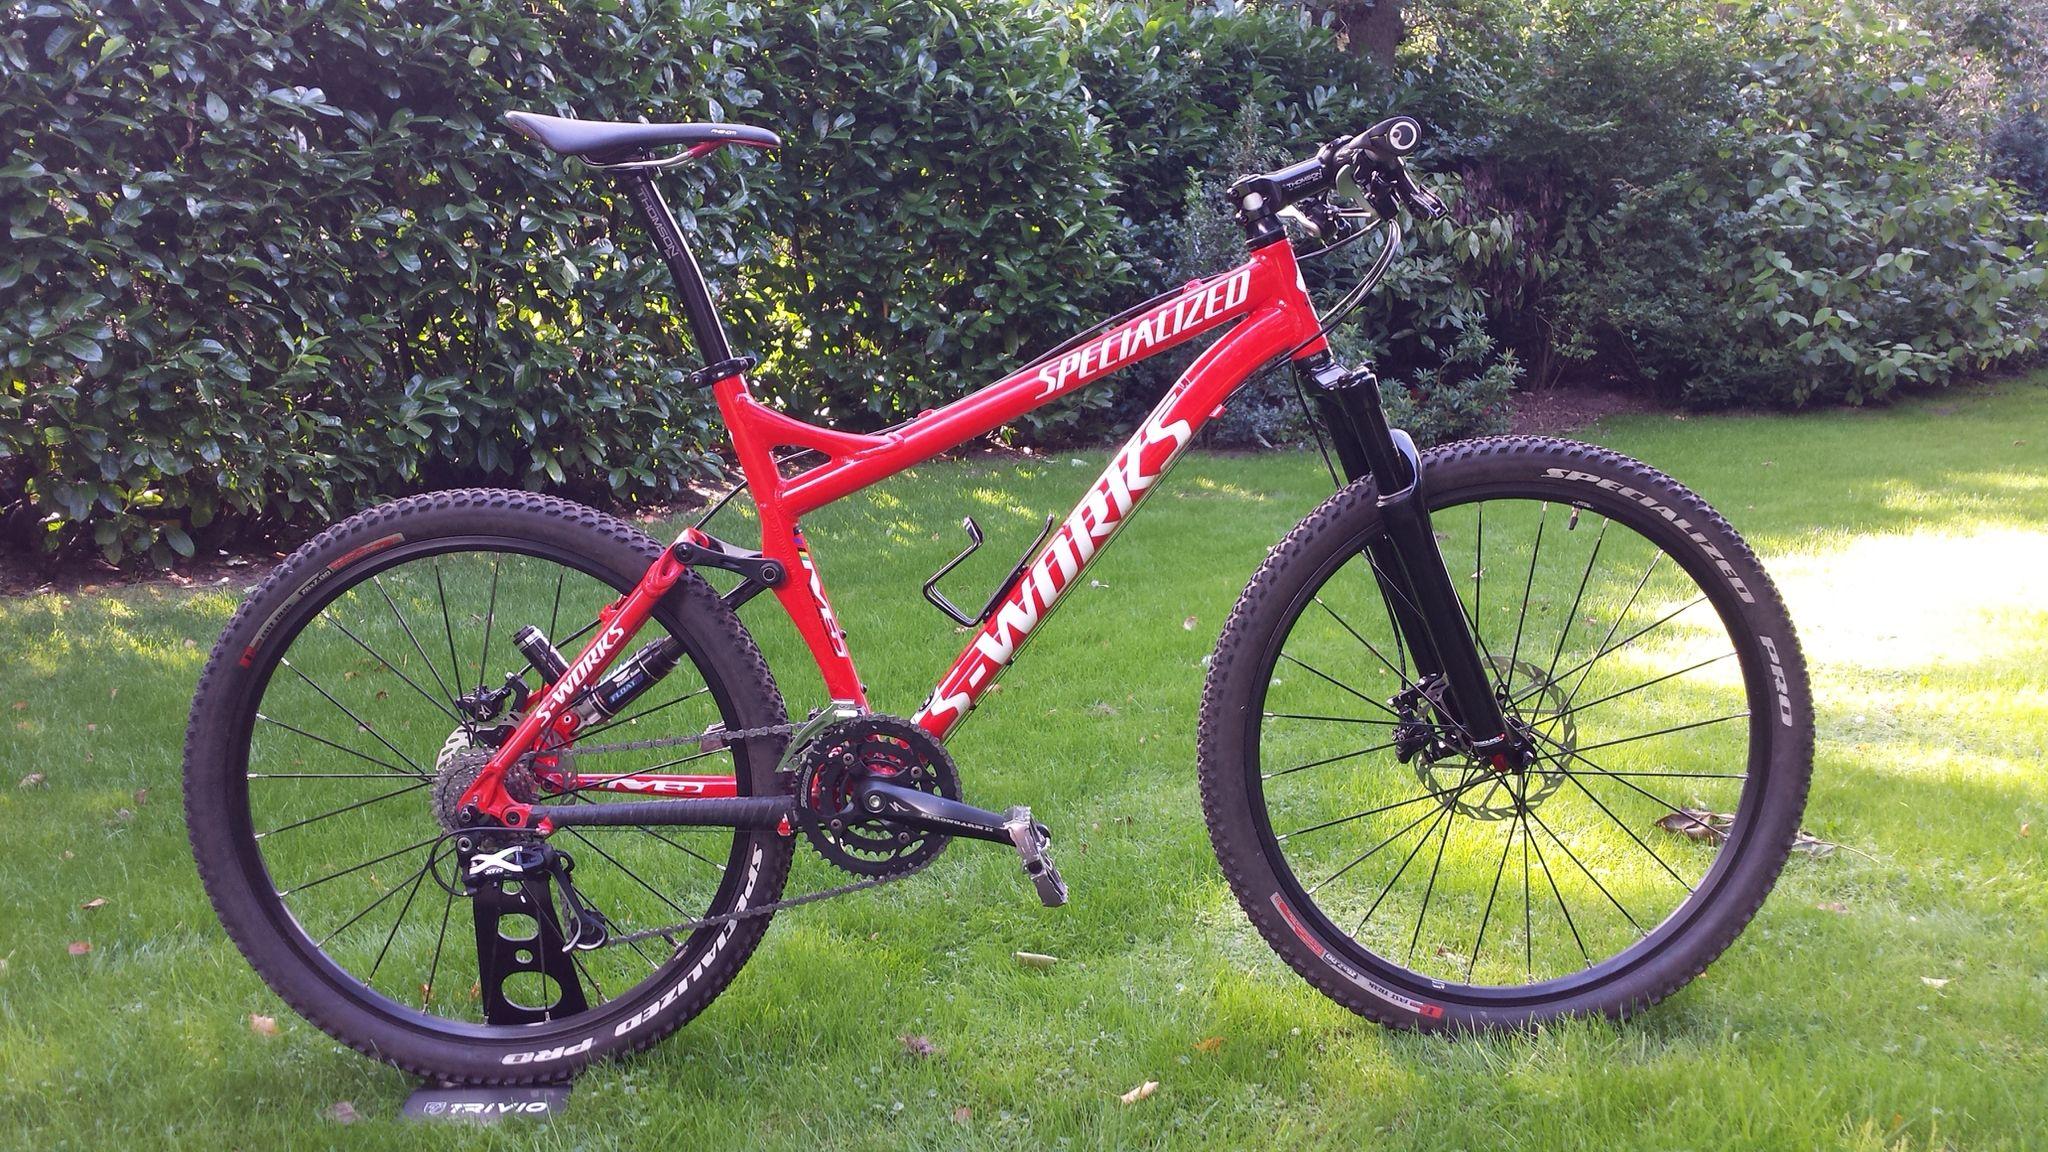 2003 S-Works FSR   bikes & bike stuff   Bike, Bicycle, Mtb